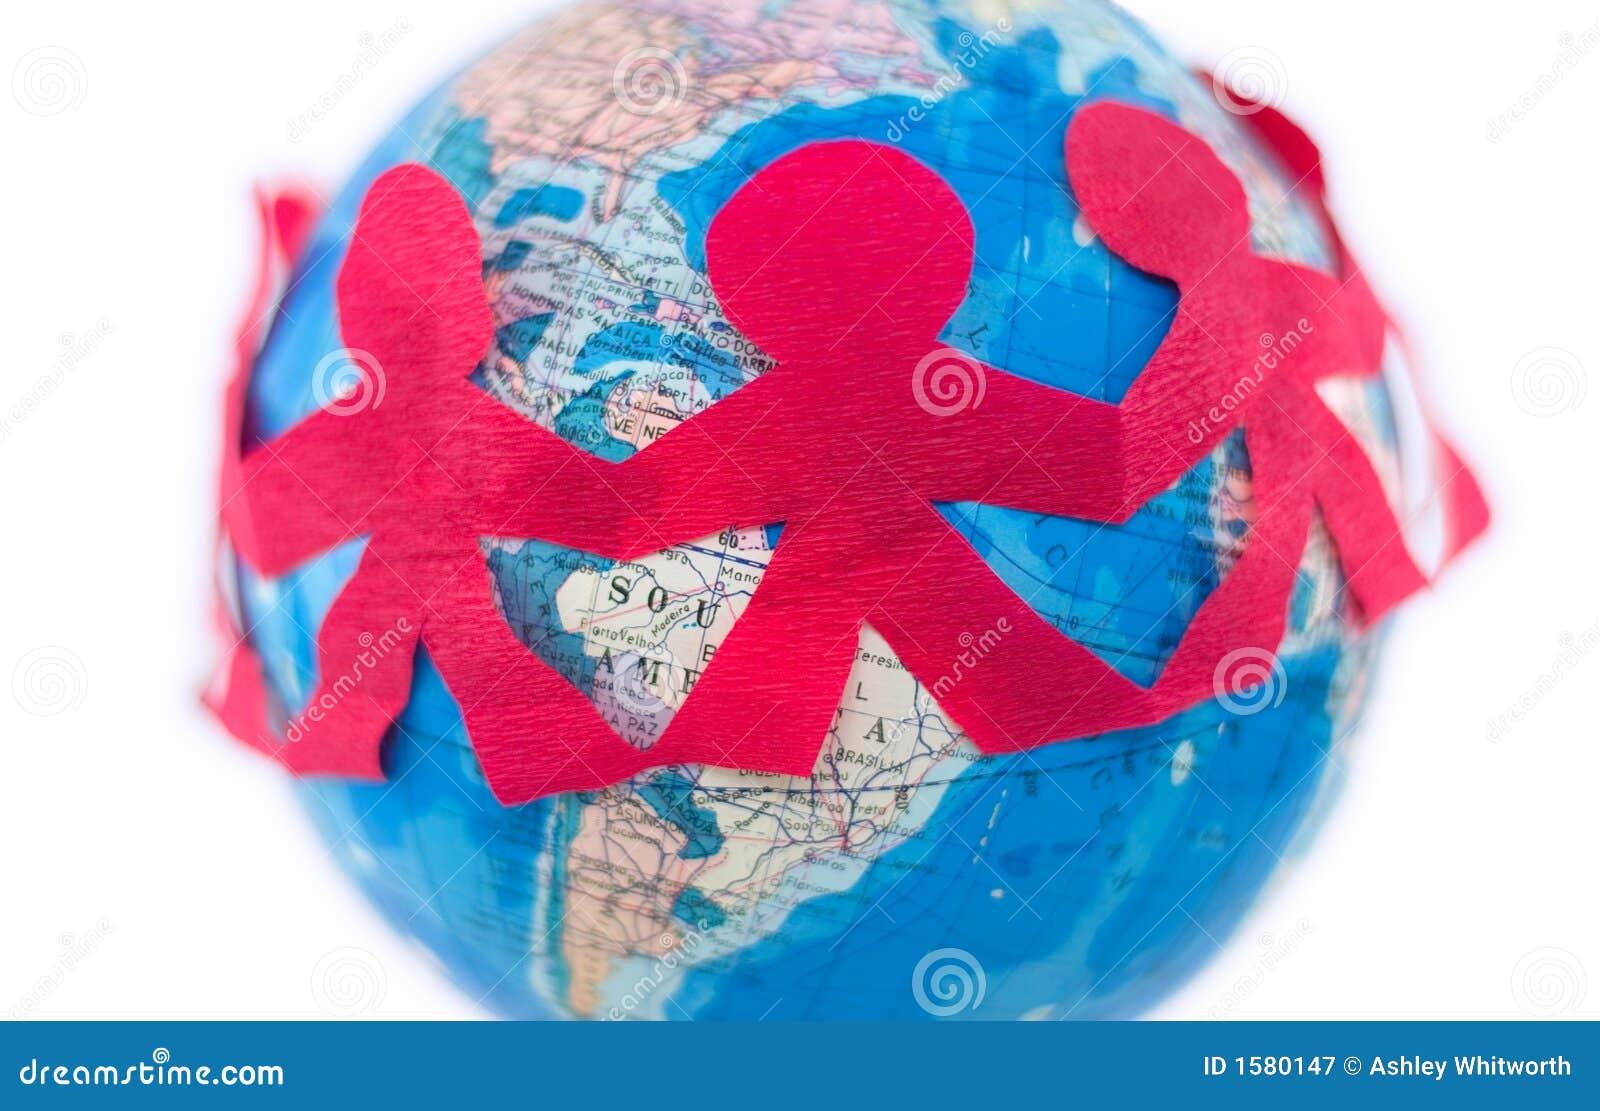 whitworth handbook of international relations